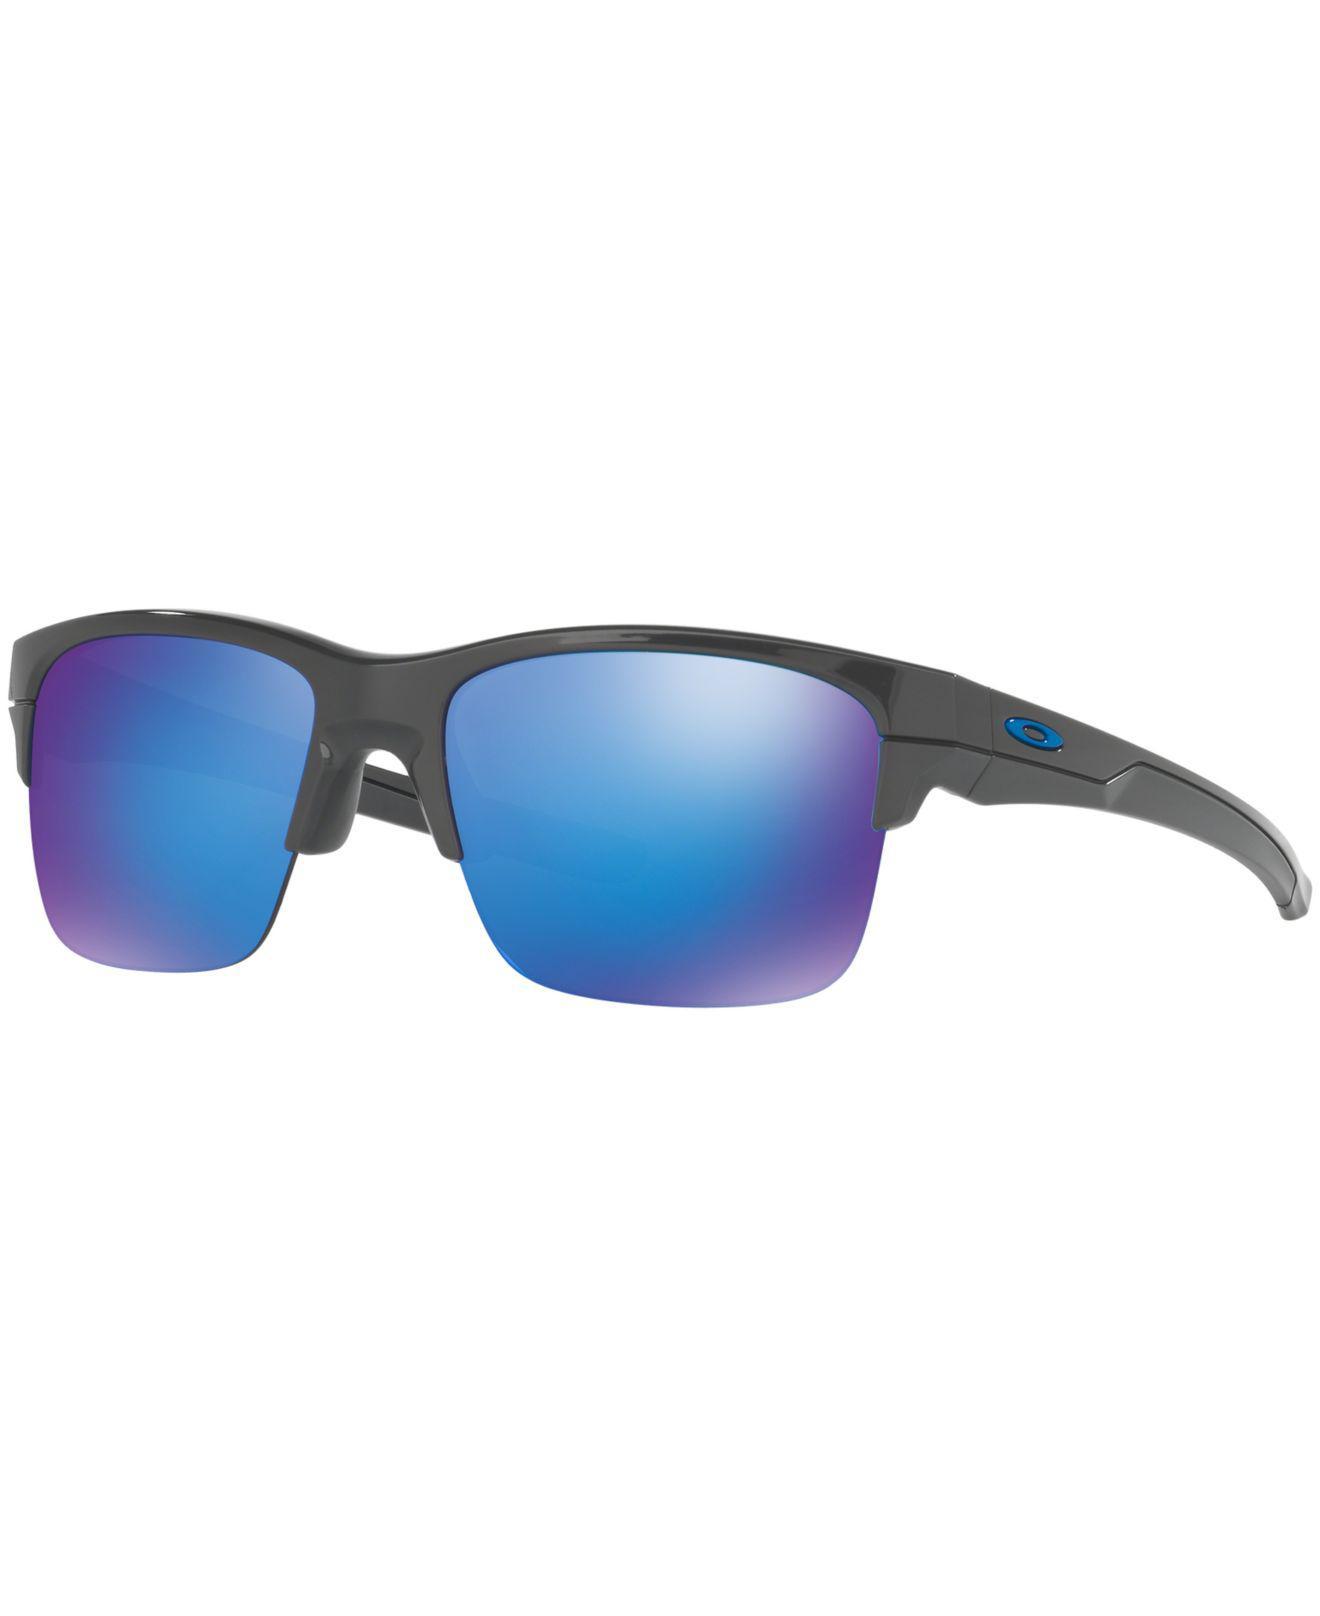 612ce226c30a5 Oakley. Men s Blue Sunglasses ...